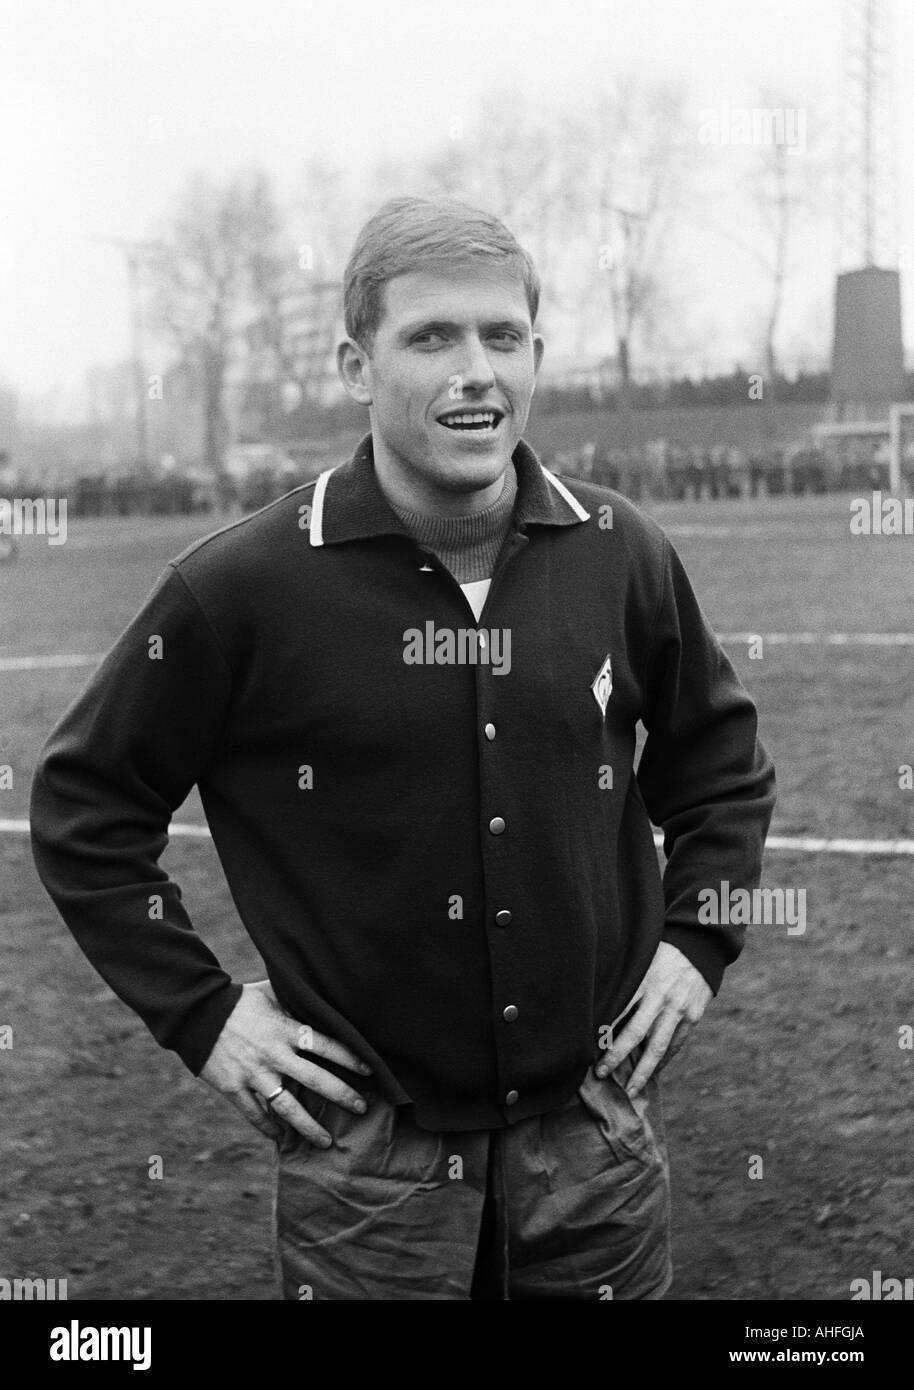 football, Bundesliga, 1965/1966, Glueckaufkampfbahn Stadium in Gelsenkirchen, Schalke 04 versus Werder Bremen 1:6, football player, portrait of John Danielsen (Bremen) - Stock Image